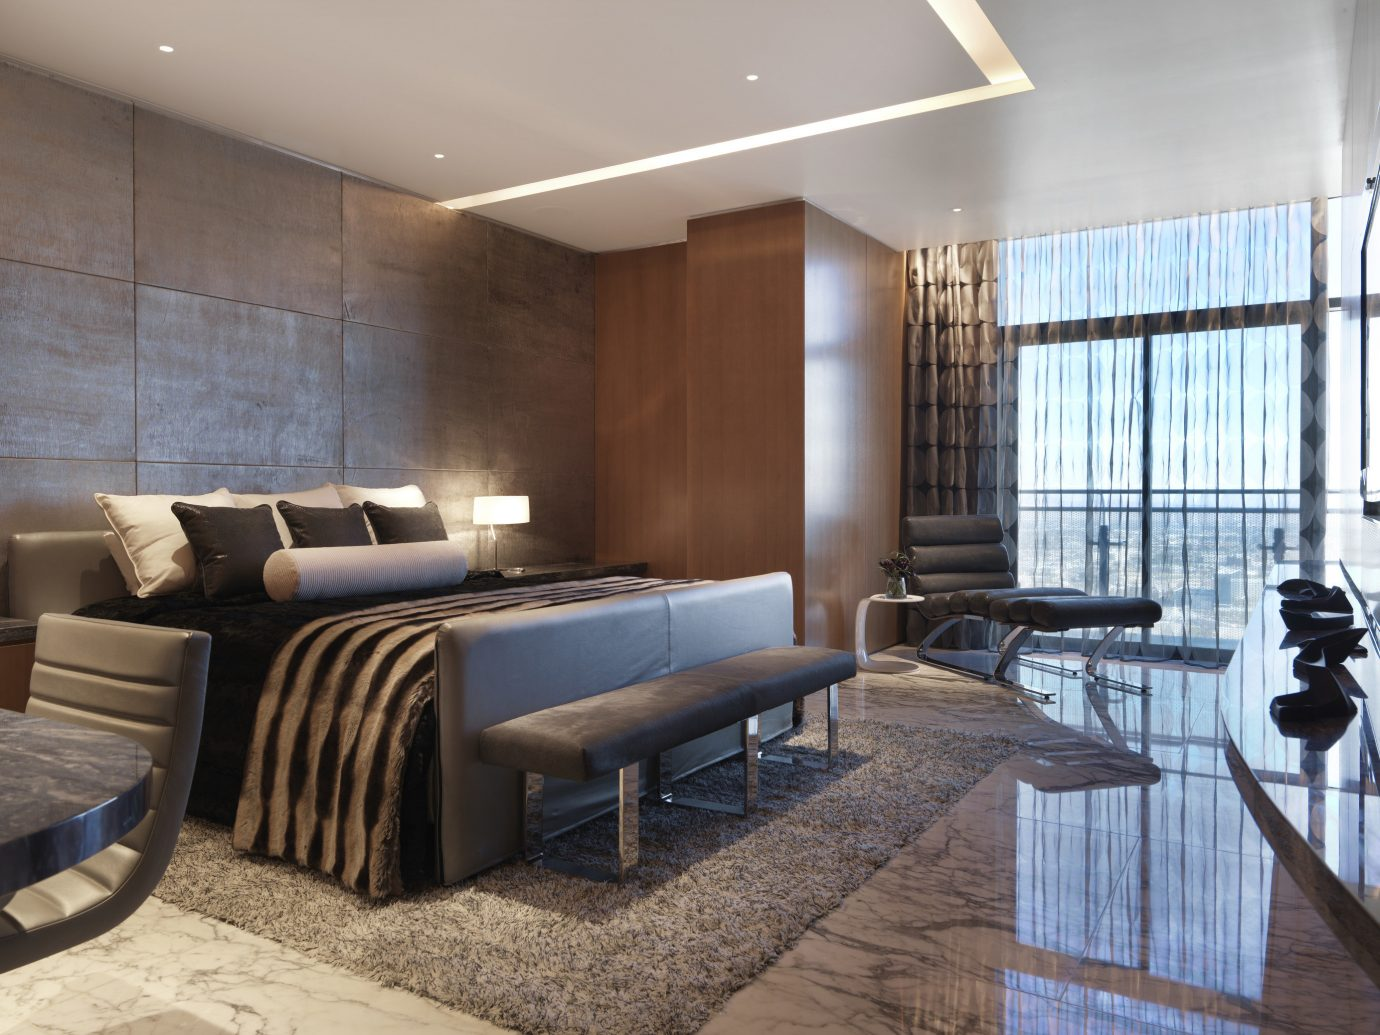 Bedroom in the Bentel & Bentel Penthouse Suites, The Cosmopolitan of Las Vegas